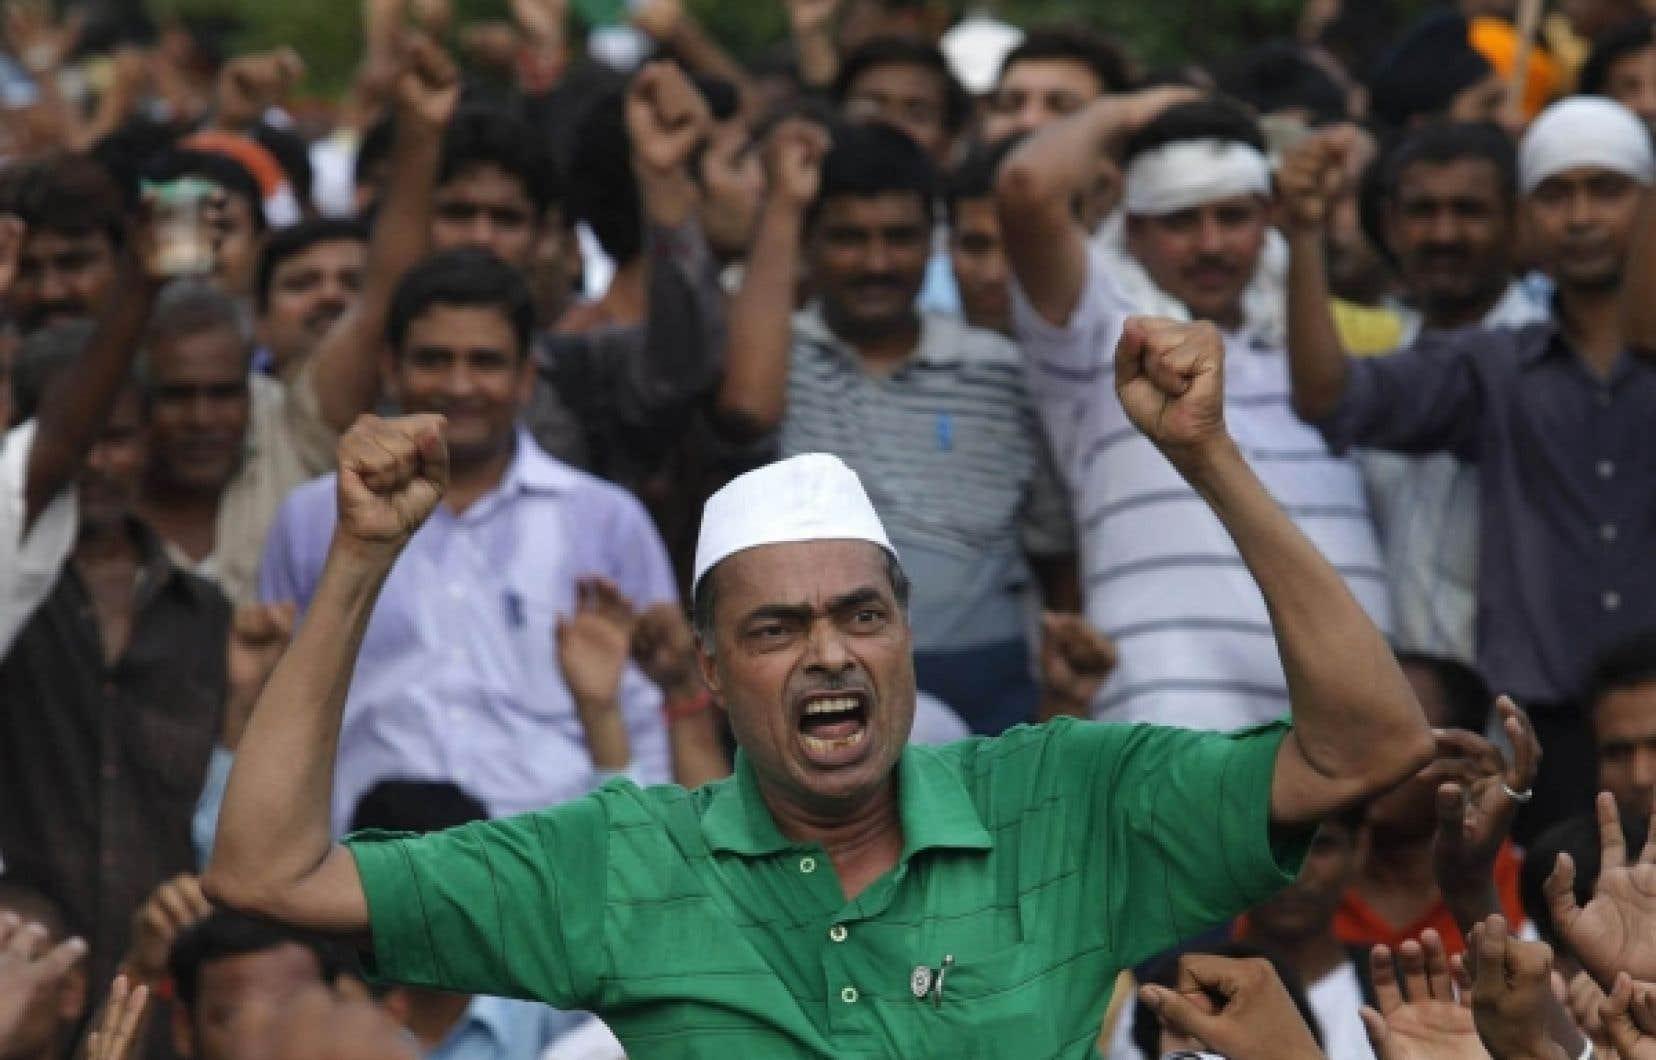 Un partisan d'Anna Hazare hier, à Delhi